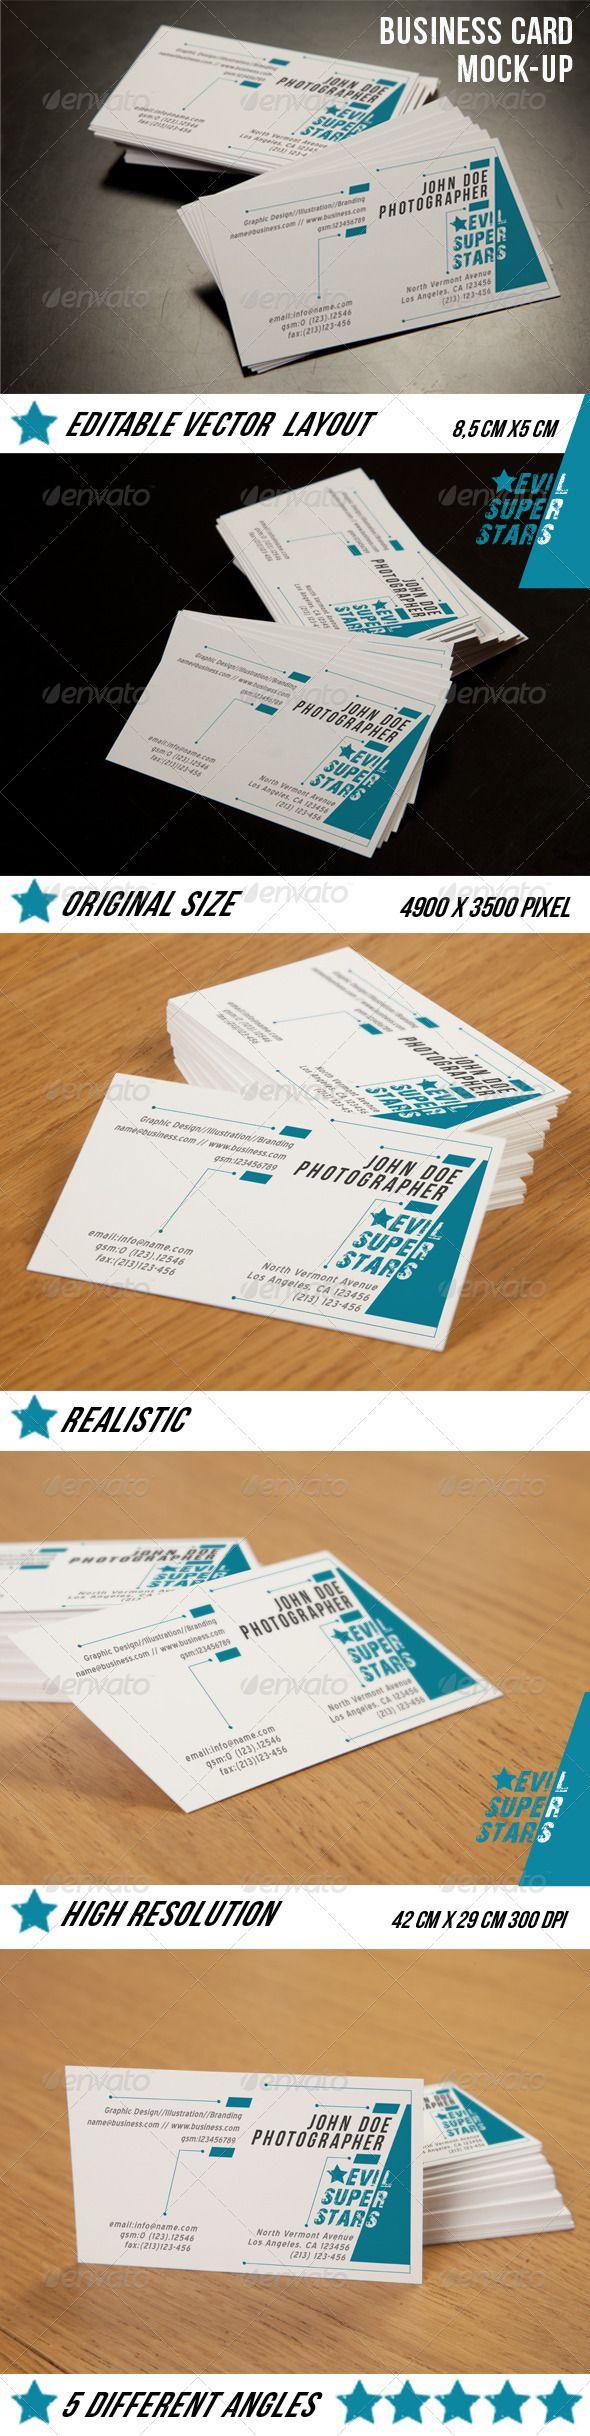 747 best Card Design images on Pinterest | Name cards, Business ...